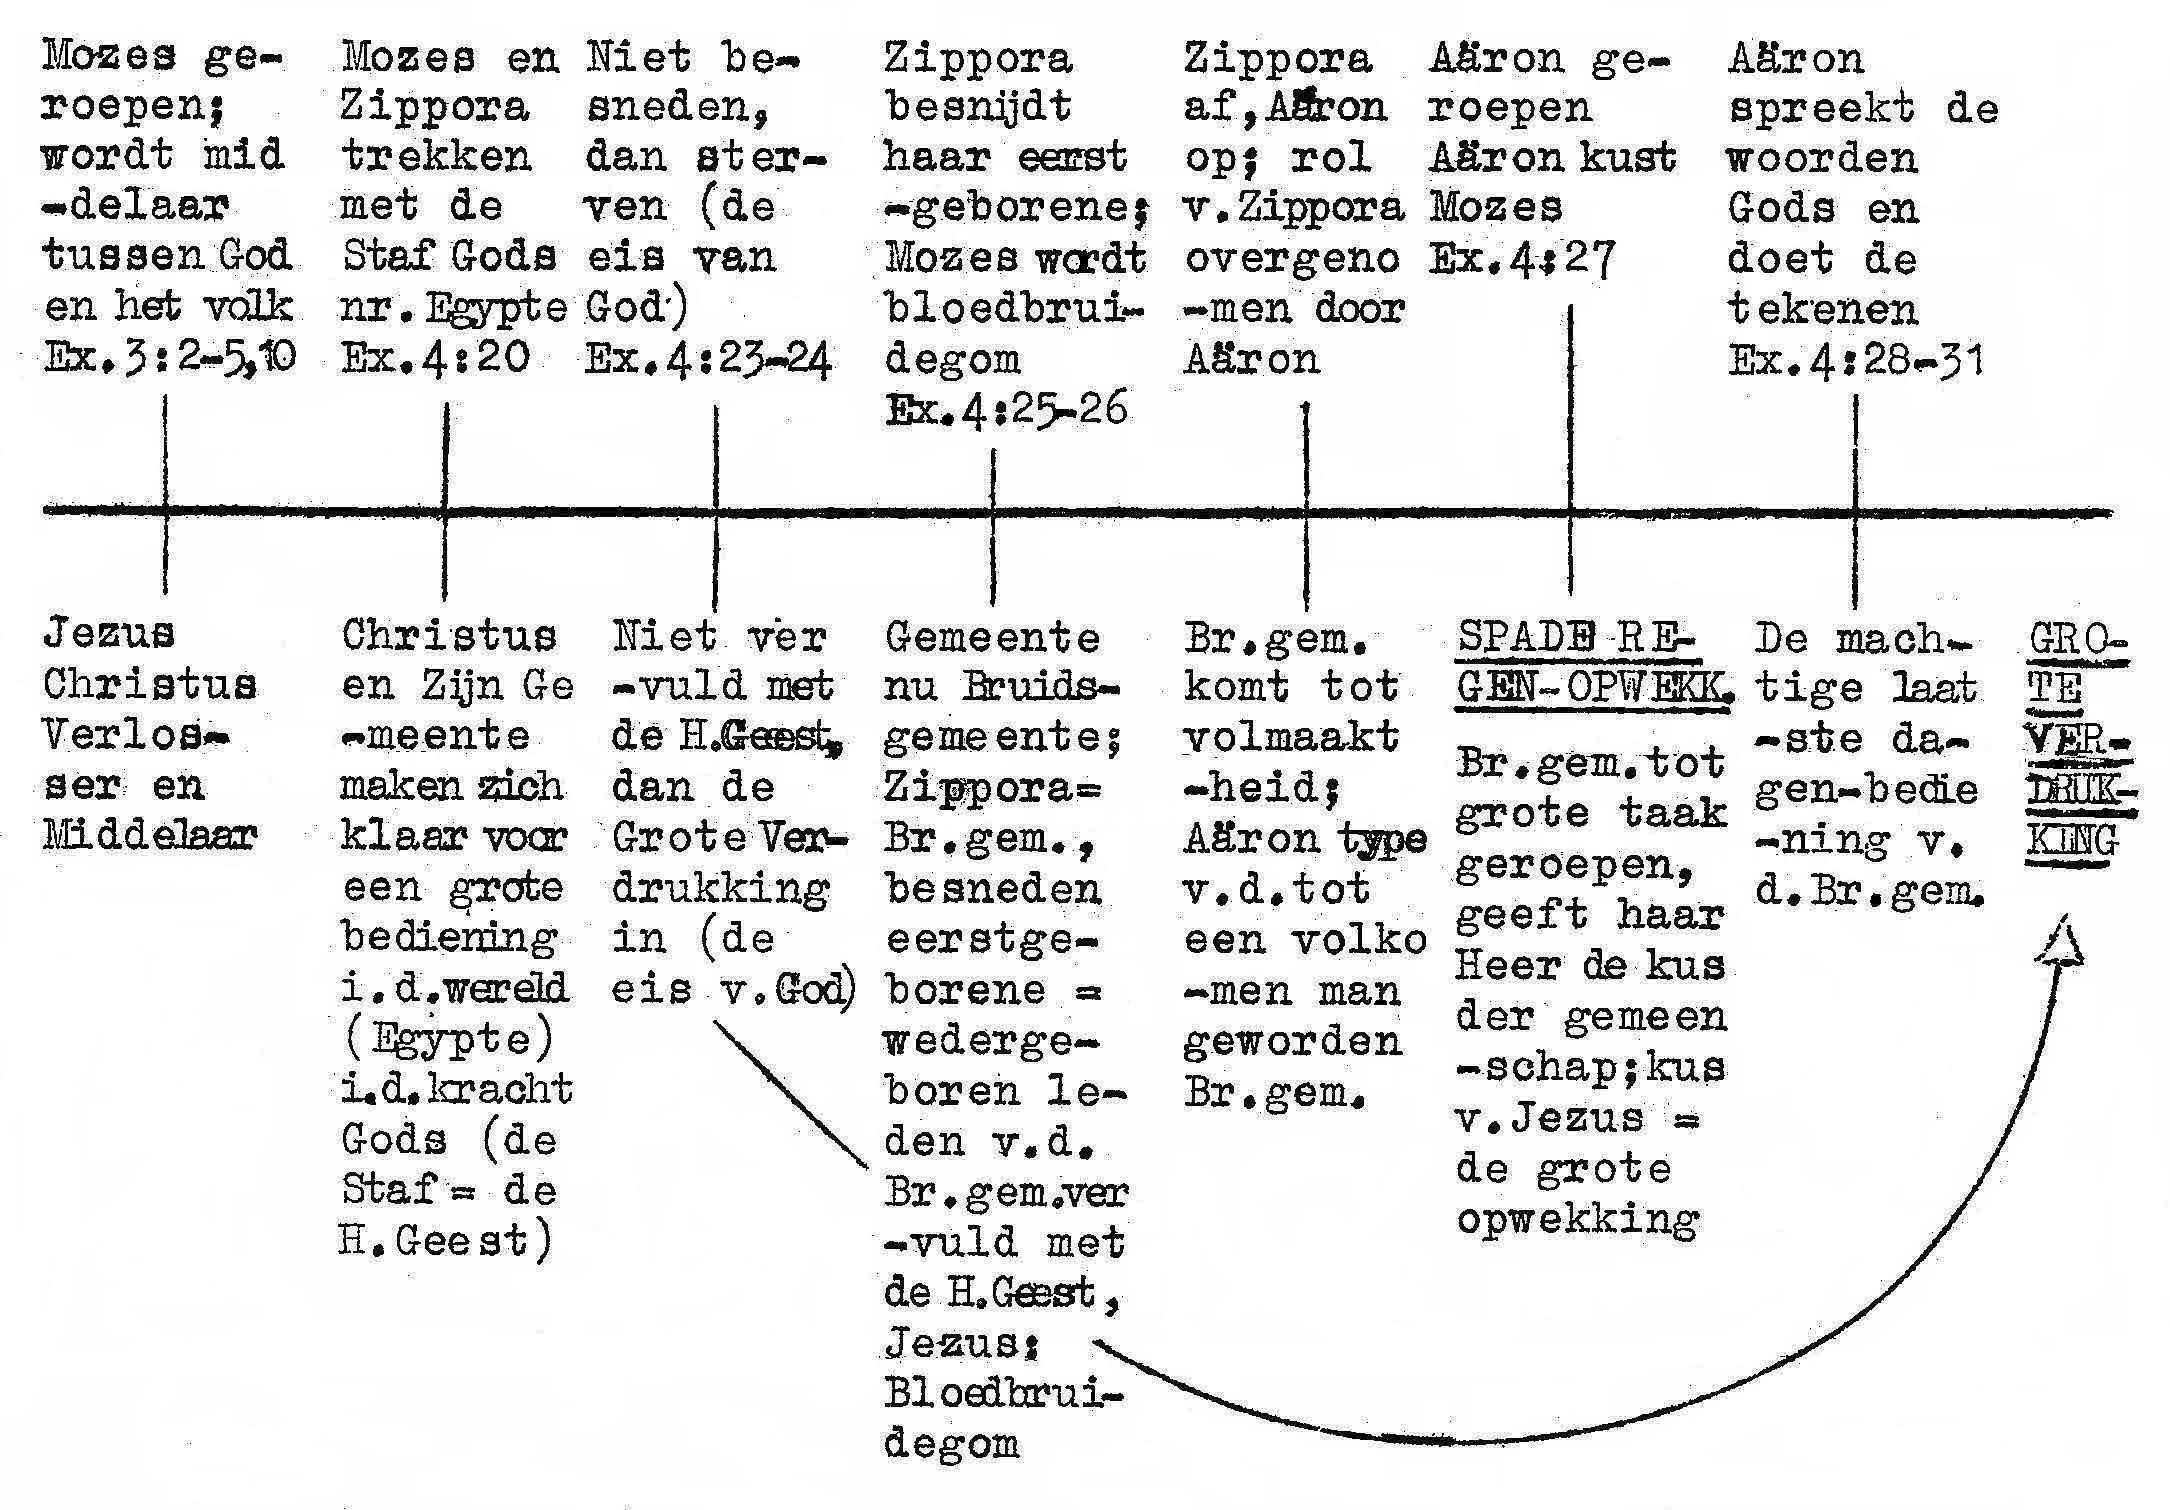 Bloedbruidegom - schema